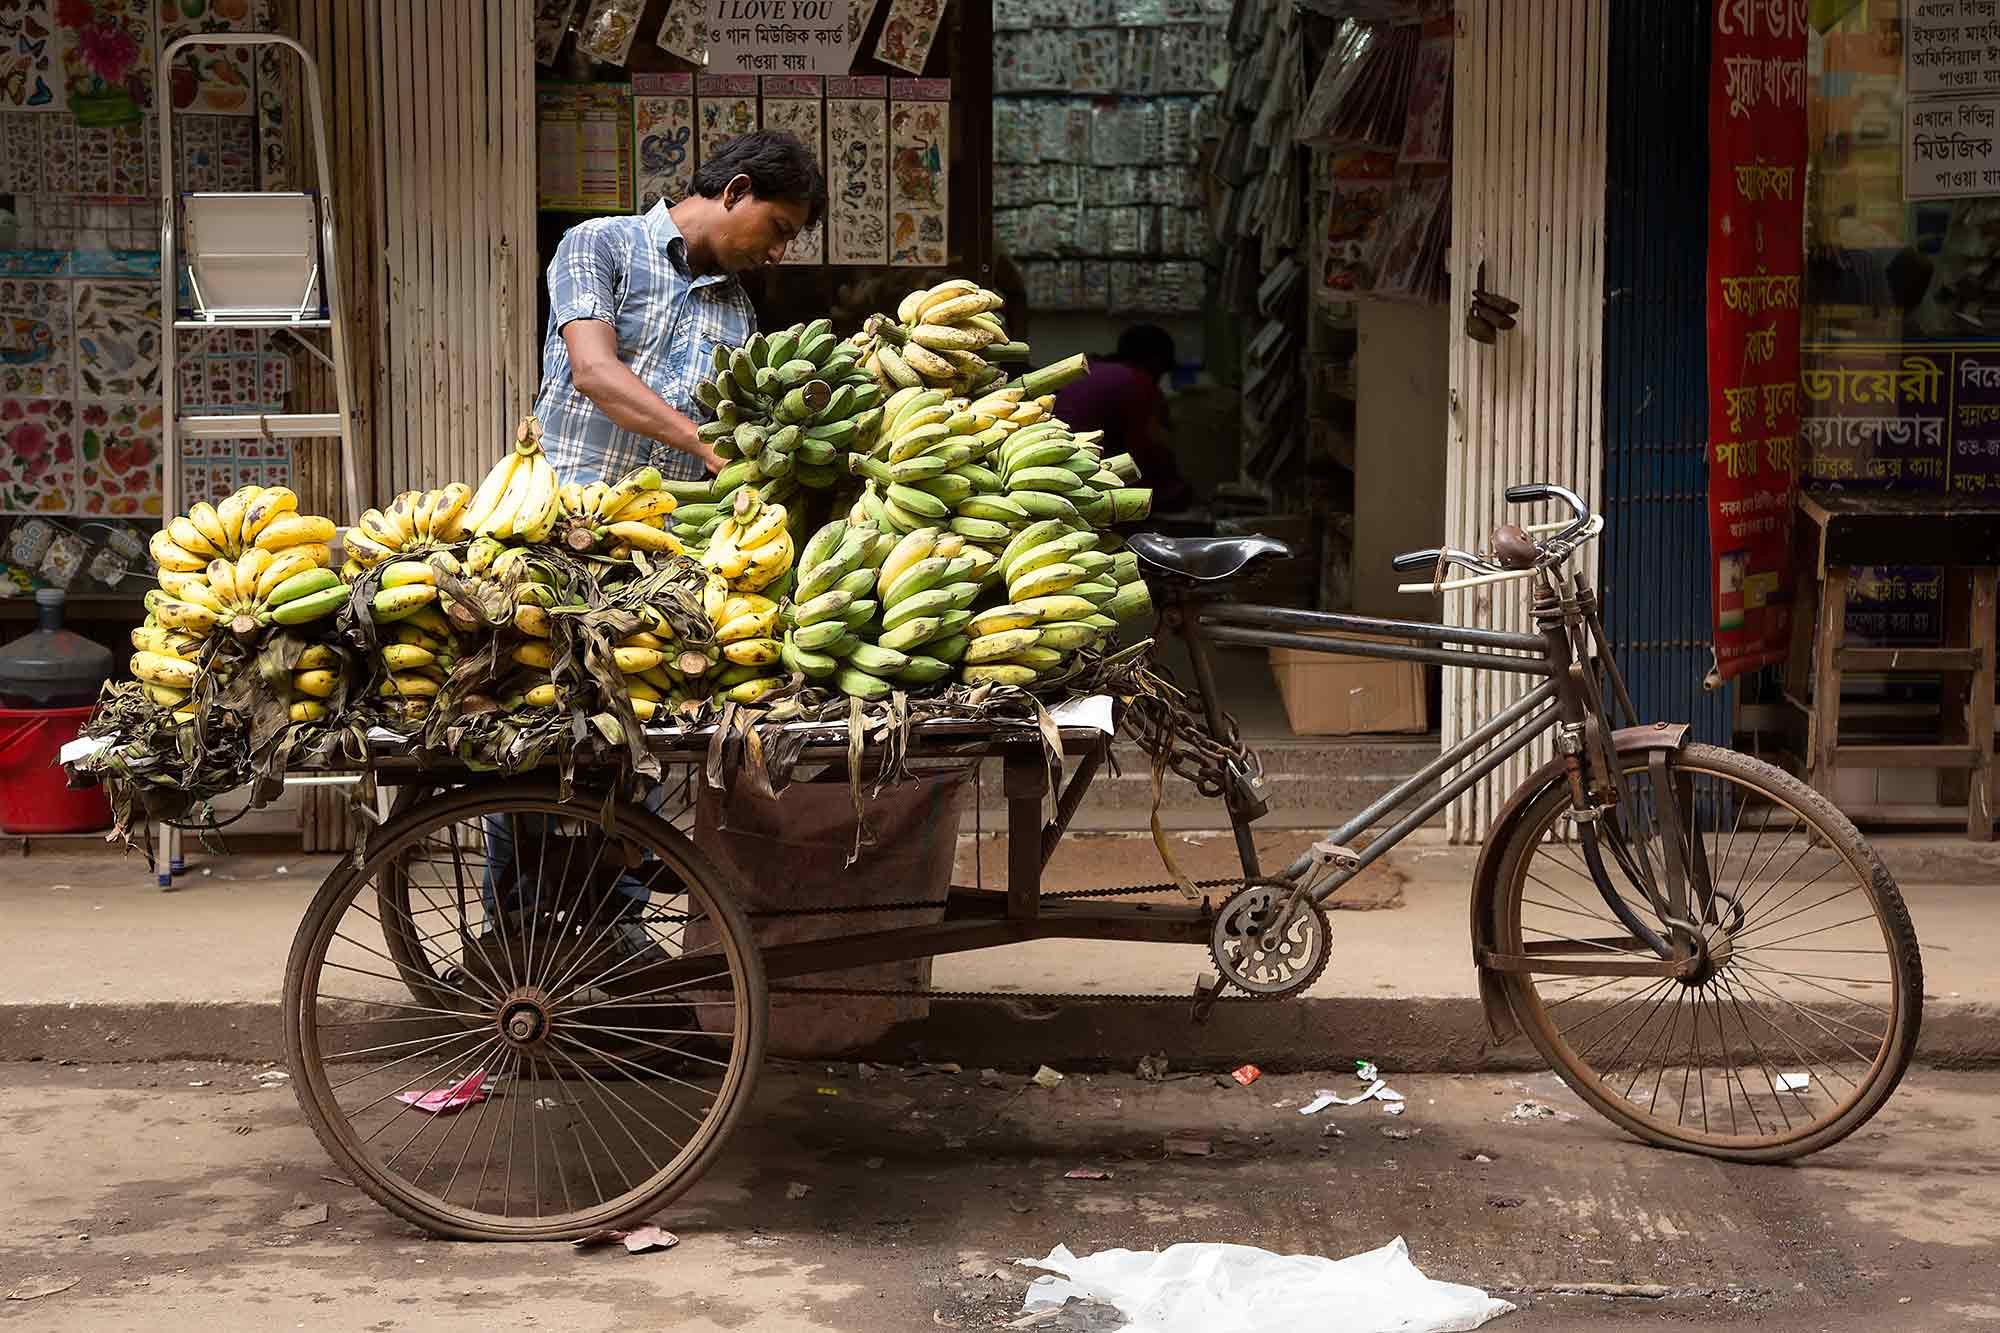 A street vendor selling bananas in Dhaka, Bangladesh. © Ulli Maier & Nisa Maier